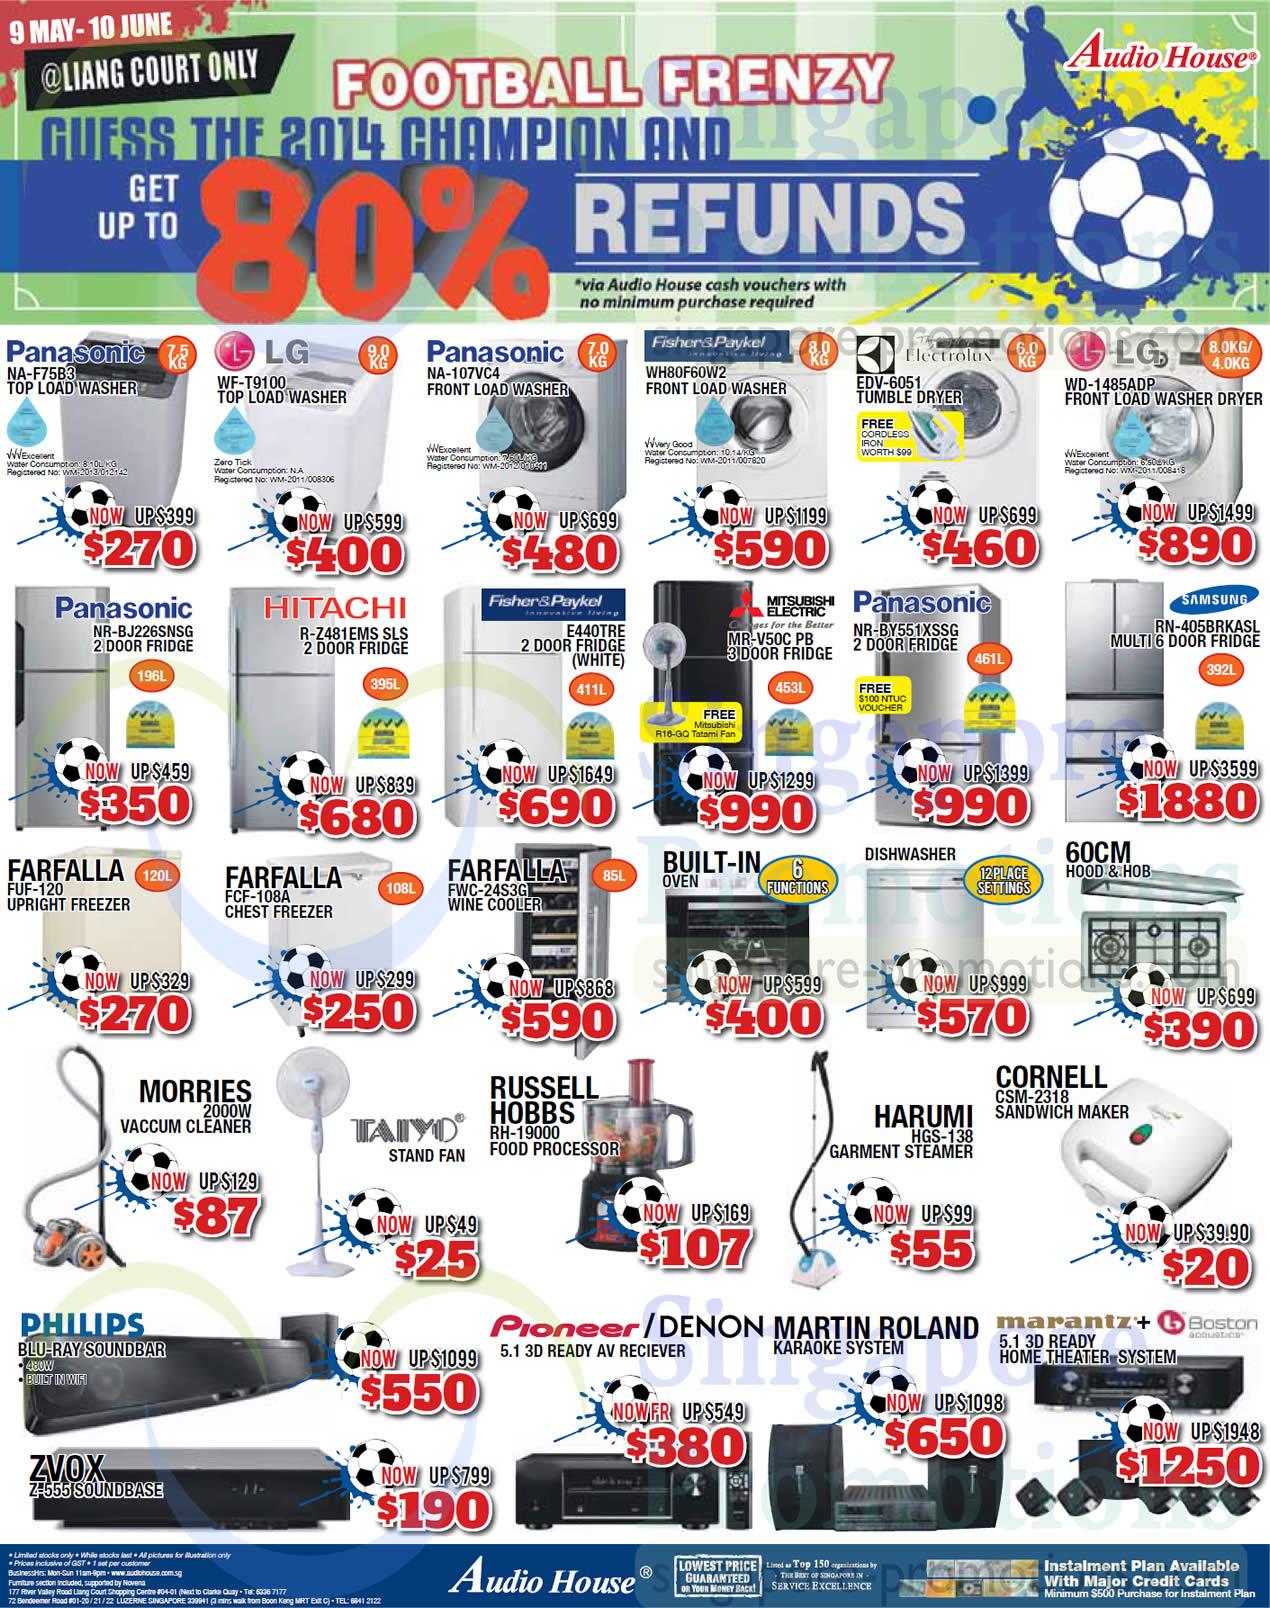 Panasonic NA-F75B3 Washer, LG WF-T9100 Washer, Panasonic NA-107VC4 Washer, Fisher&Paykel WH80F60W2 Washer, Electrolux EDV-6051 Dryer, LG WD-1485ADP Washer/Dryer, Panasonic NR-BJ226SNSG Fridge, Hitachi R-Z481EMS Fridge, Fisher&Paykel E440TRE Fridge, Mitsubishi Electric MR-V50C PB Fridge, Panasonic NR-BY551XSSG Fridge, Samsung RN-405BRKASL Fridge, Farfalla FUF-120 Freezer, Farfalla FCF-108A Freezer, Farfalla FWC-24S3G Wine Cooler, Russell Hobbs RH-19000 Food Processor, Harumi HGS-138 Garment Steamer, Cornell CSM-2318 Sandwich Maker and Zvox Z-555 Soundbase